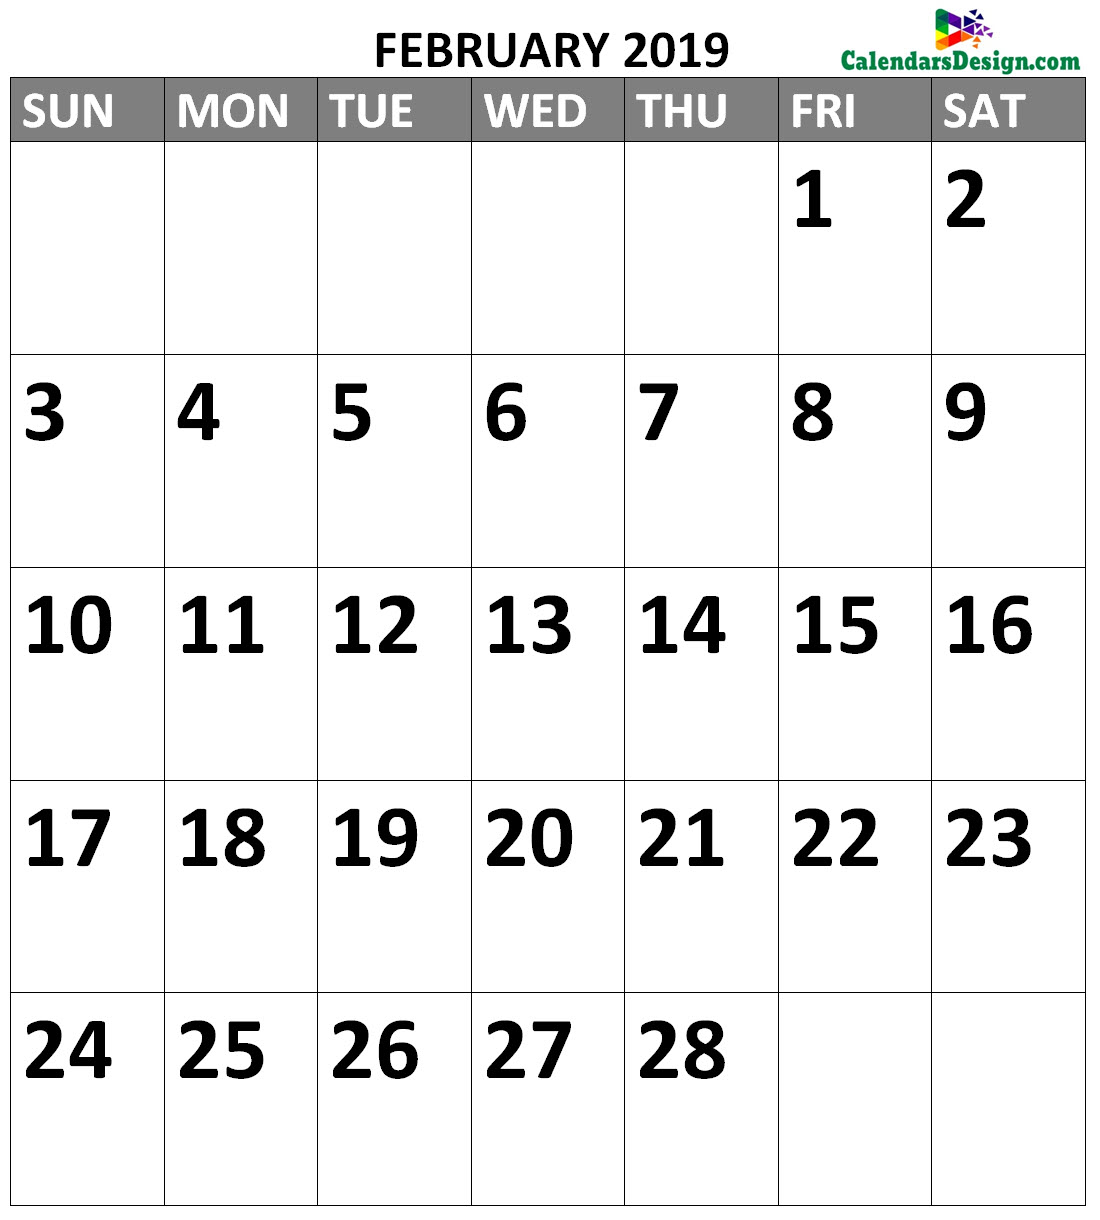 February 2019 Calendar Formats